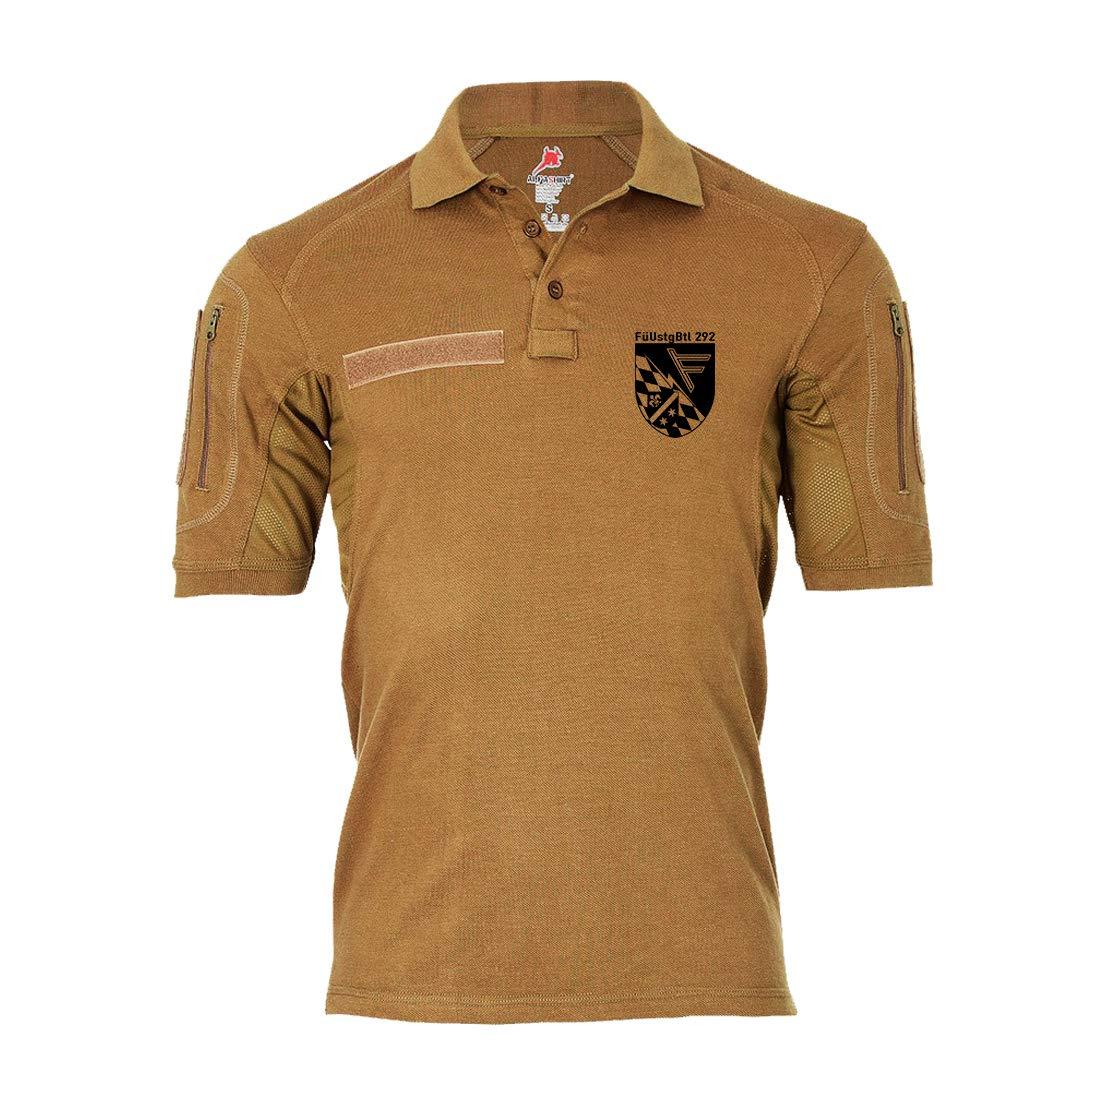 Copytec Tactical Poloshirt Alfa FüUstgBtl 292 Führungsunterstützungsbataillon BW #19200